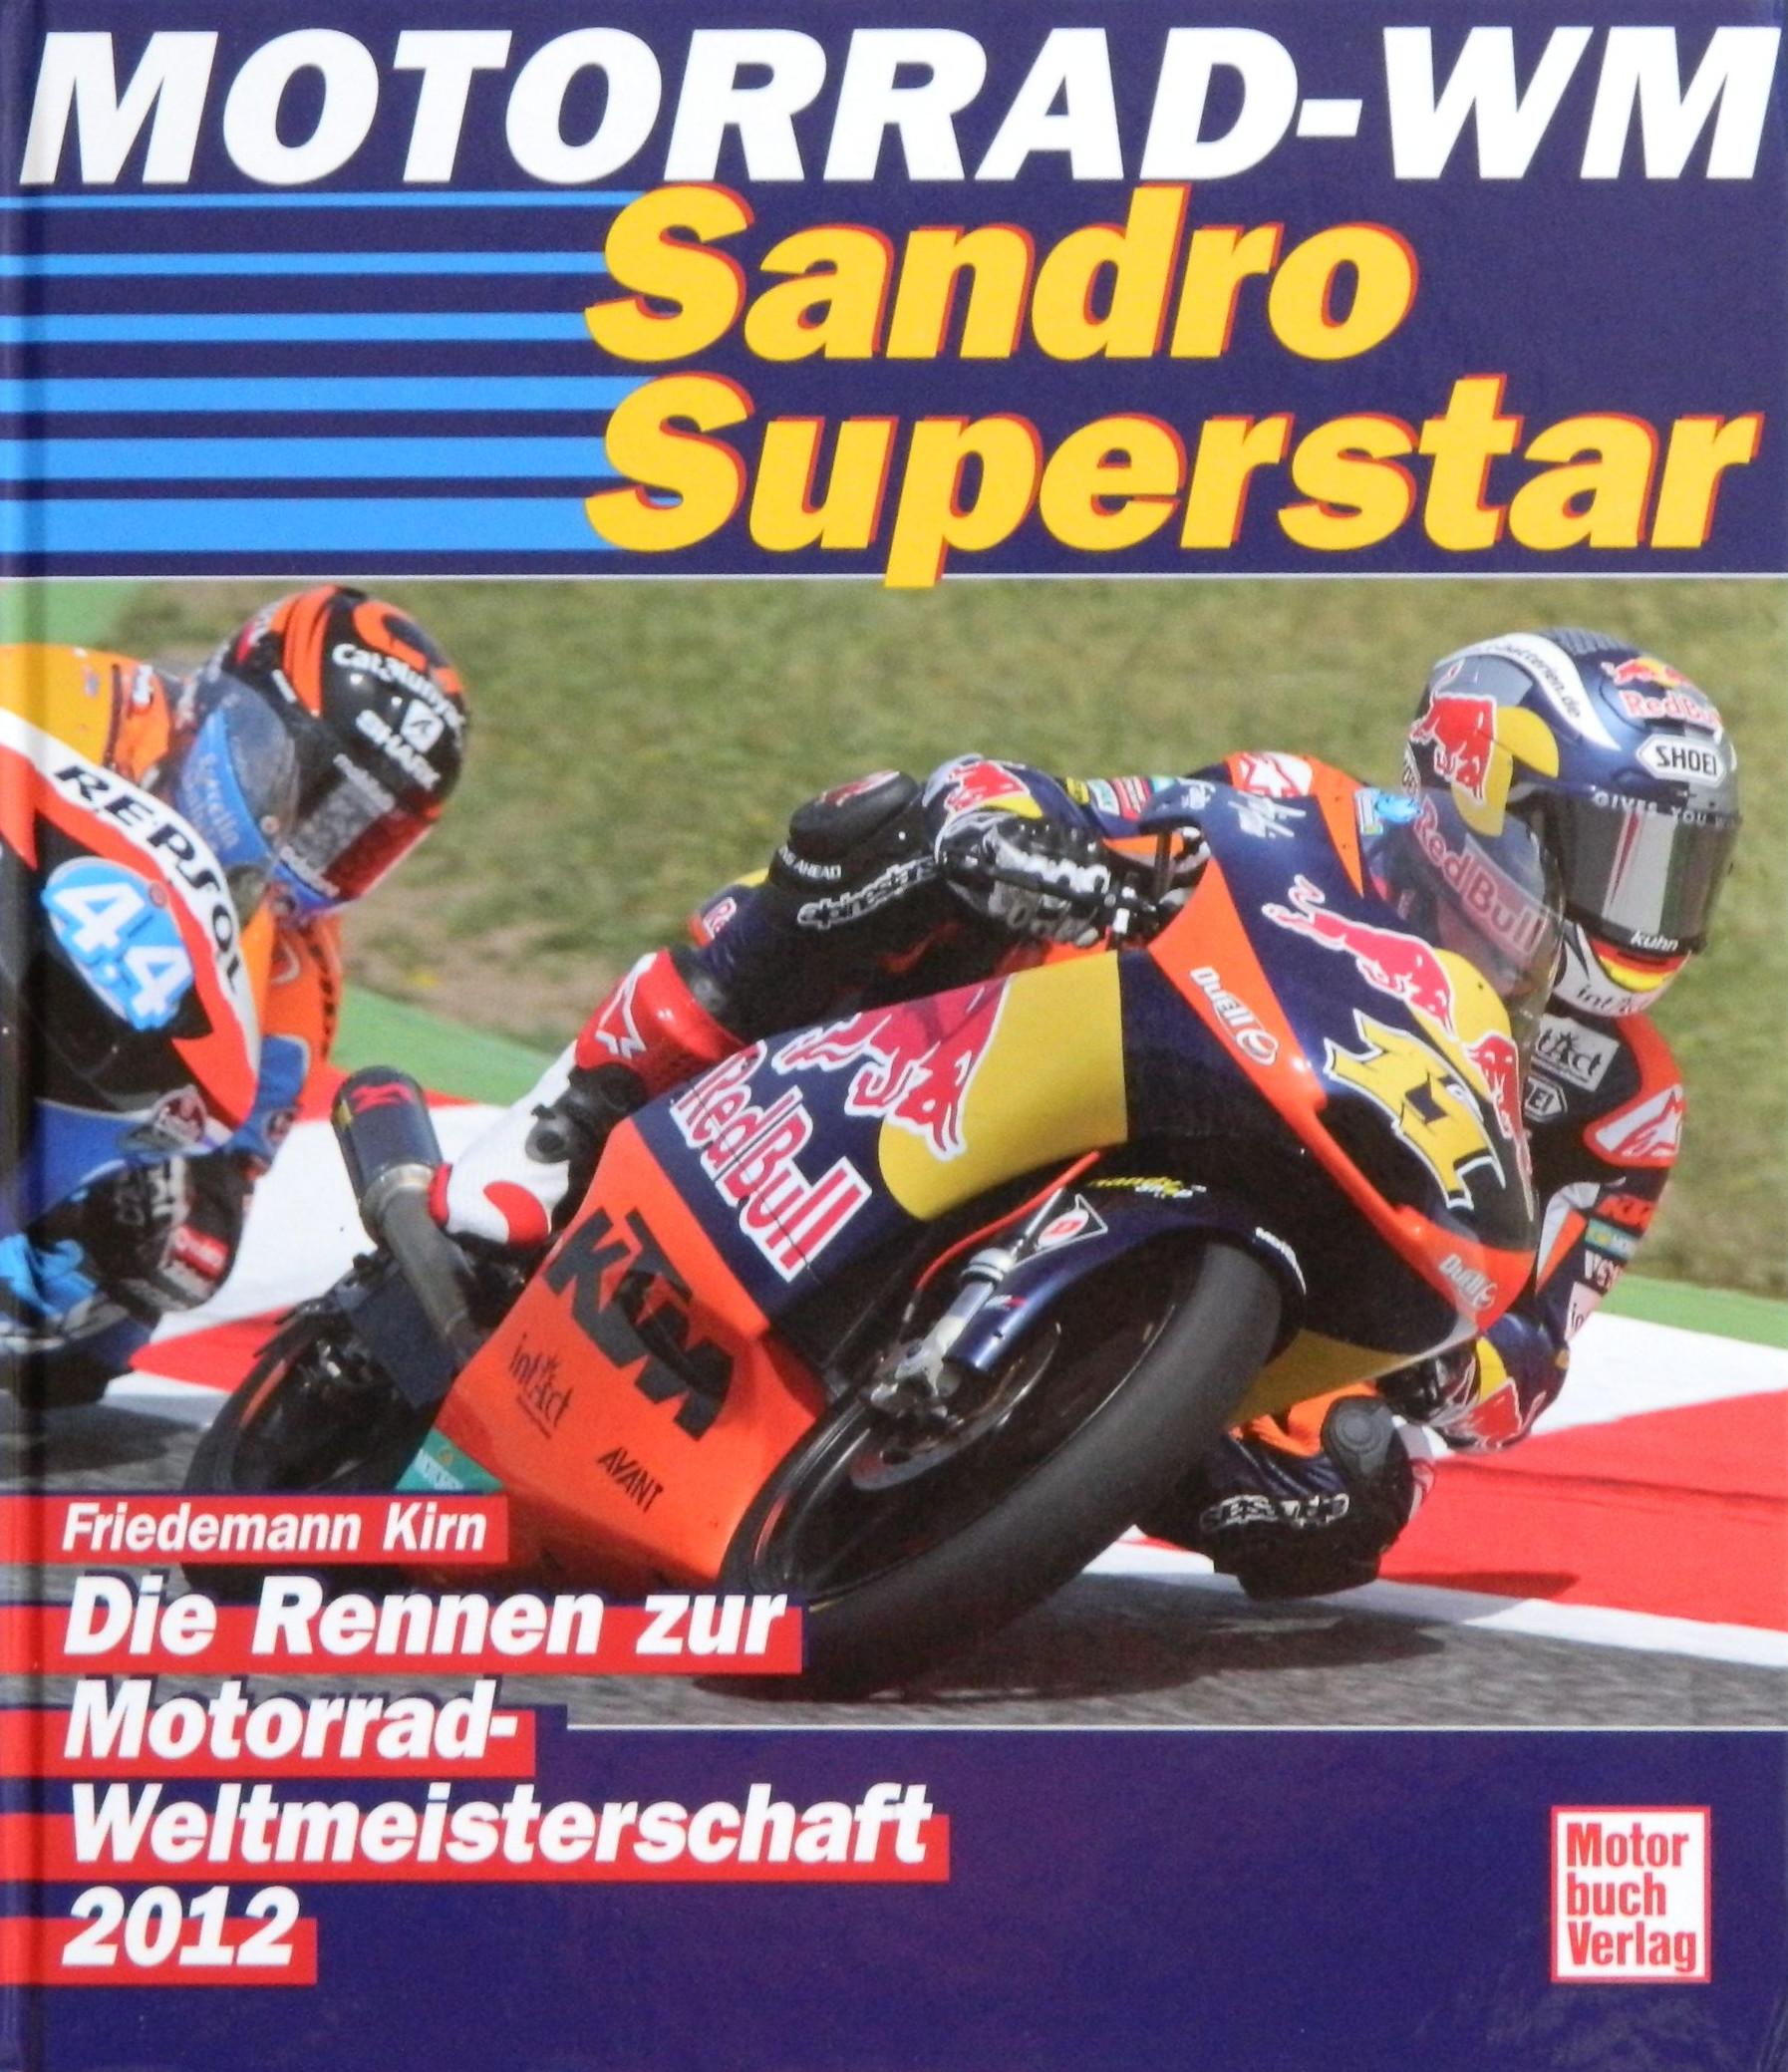 Motorrad Weltmeisterschaft